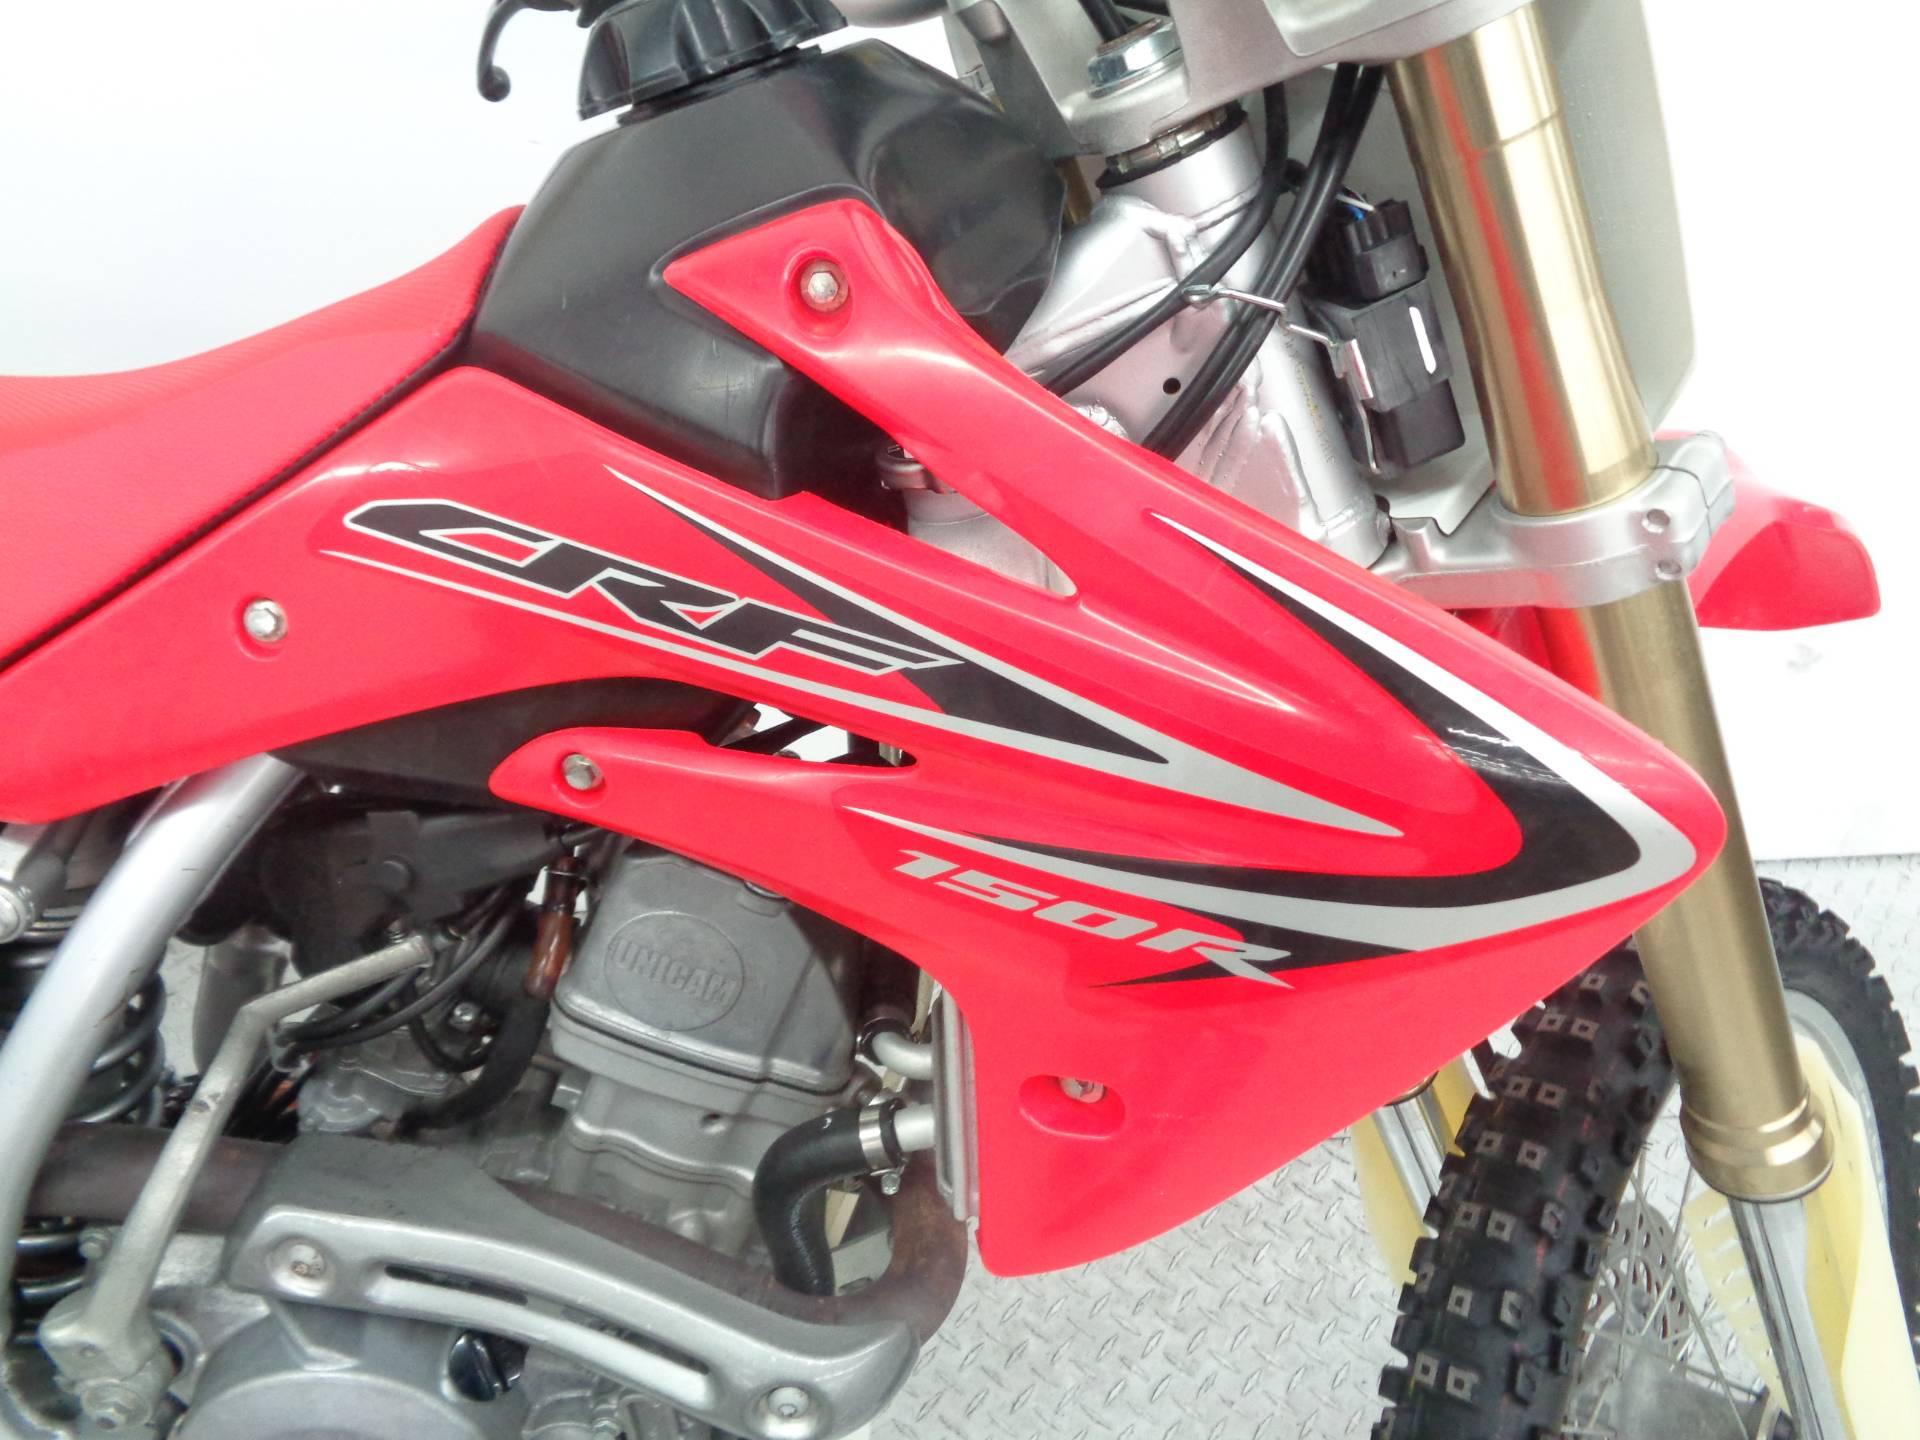 Used 2013 Honda CRF®150R Motorcycles in Tulsa, OK | Stock Number: 400334